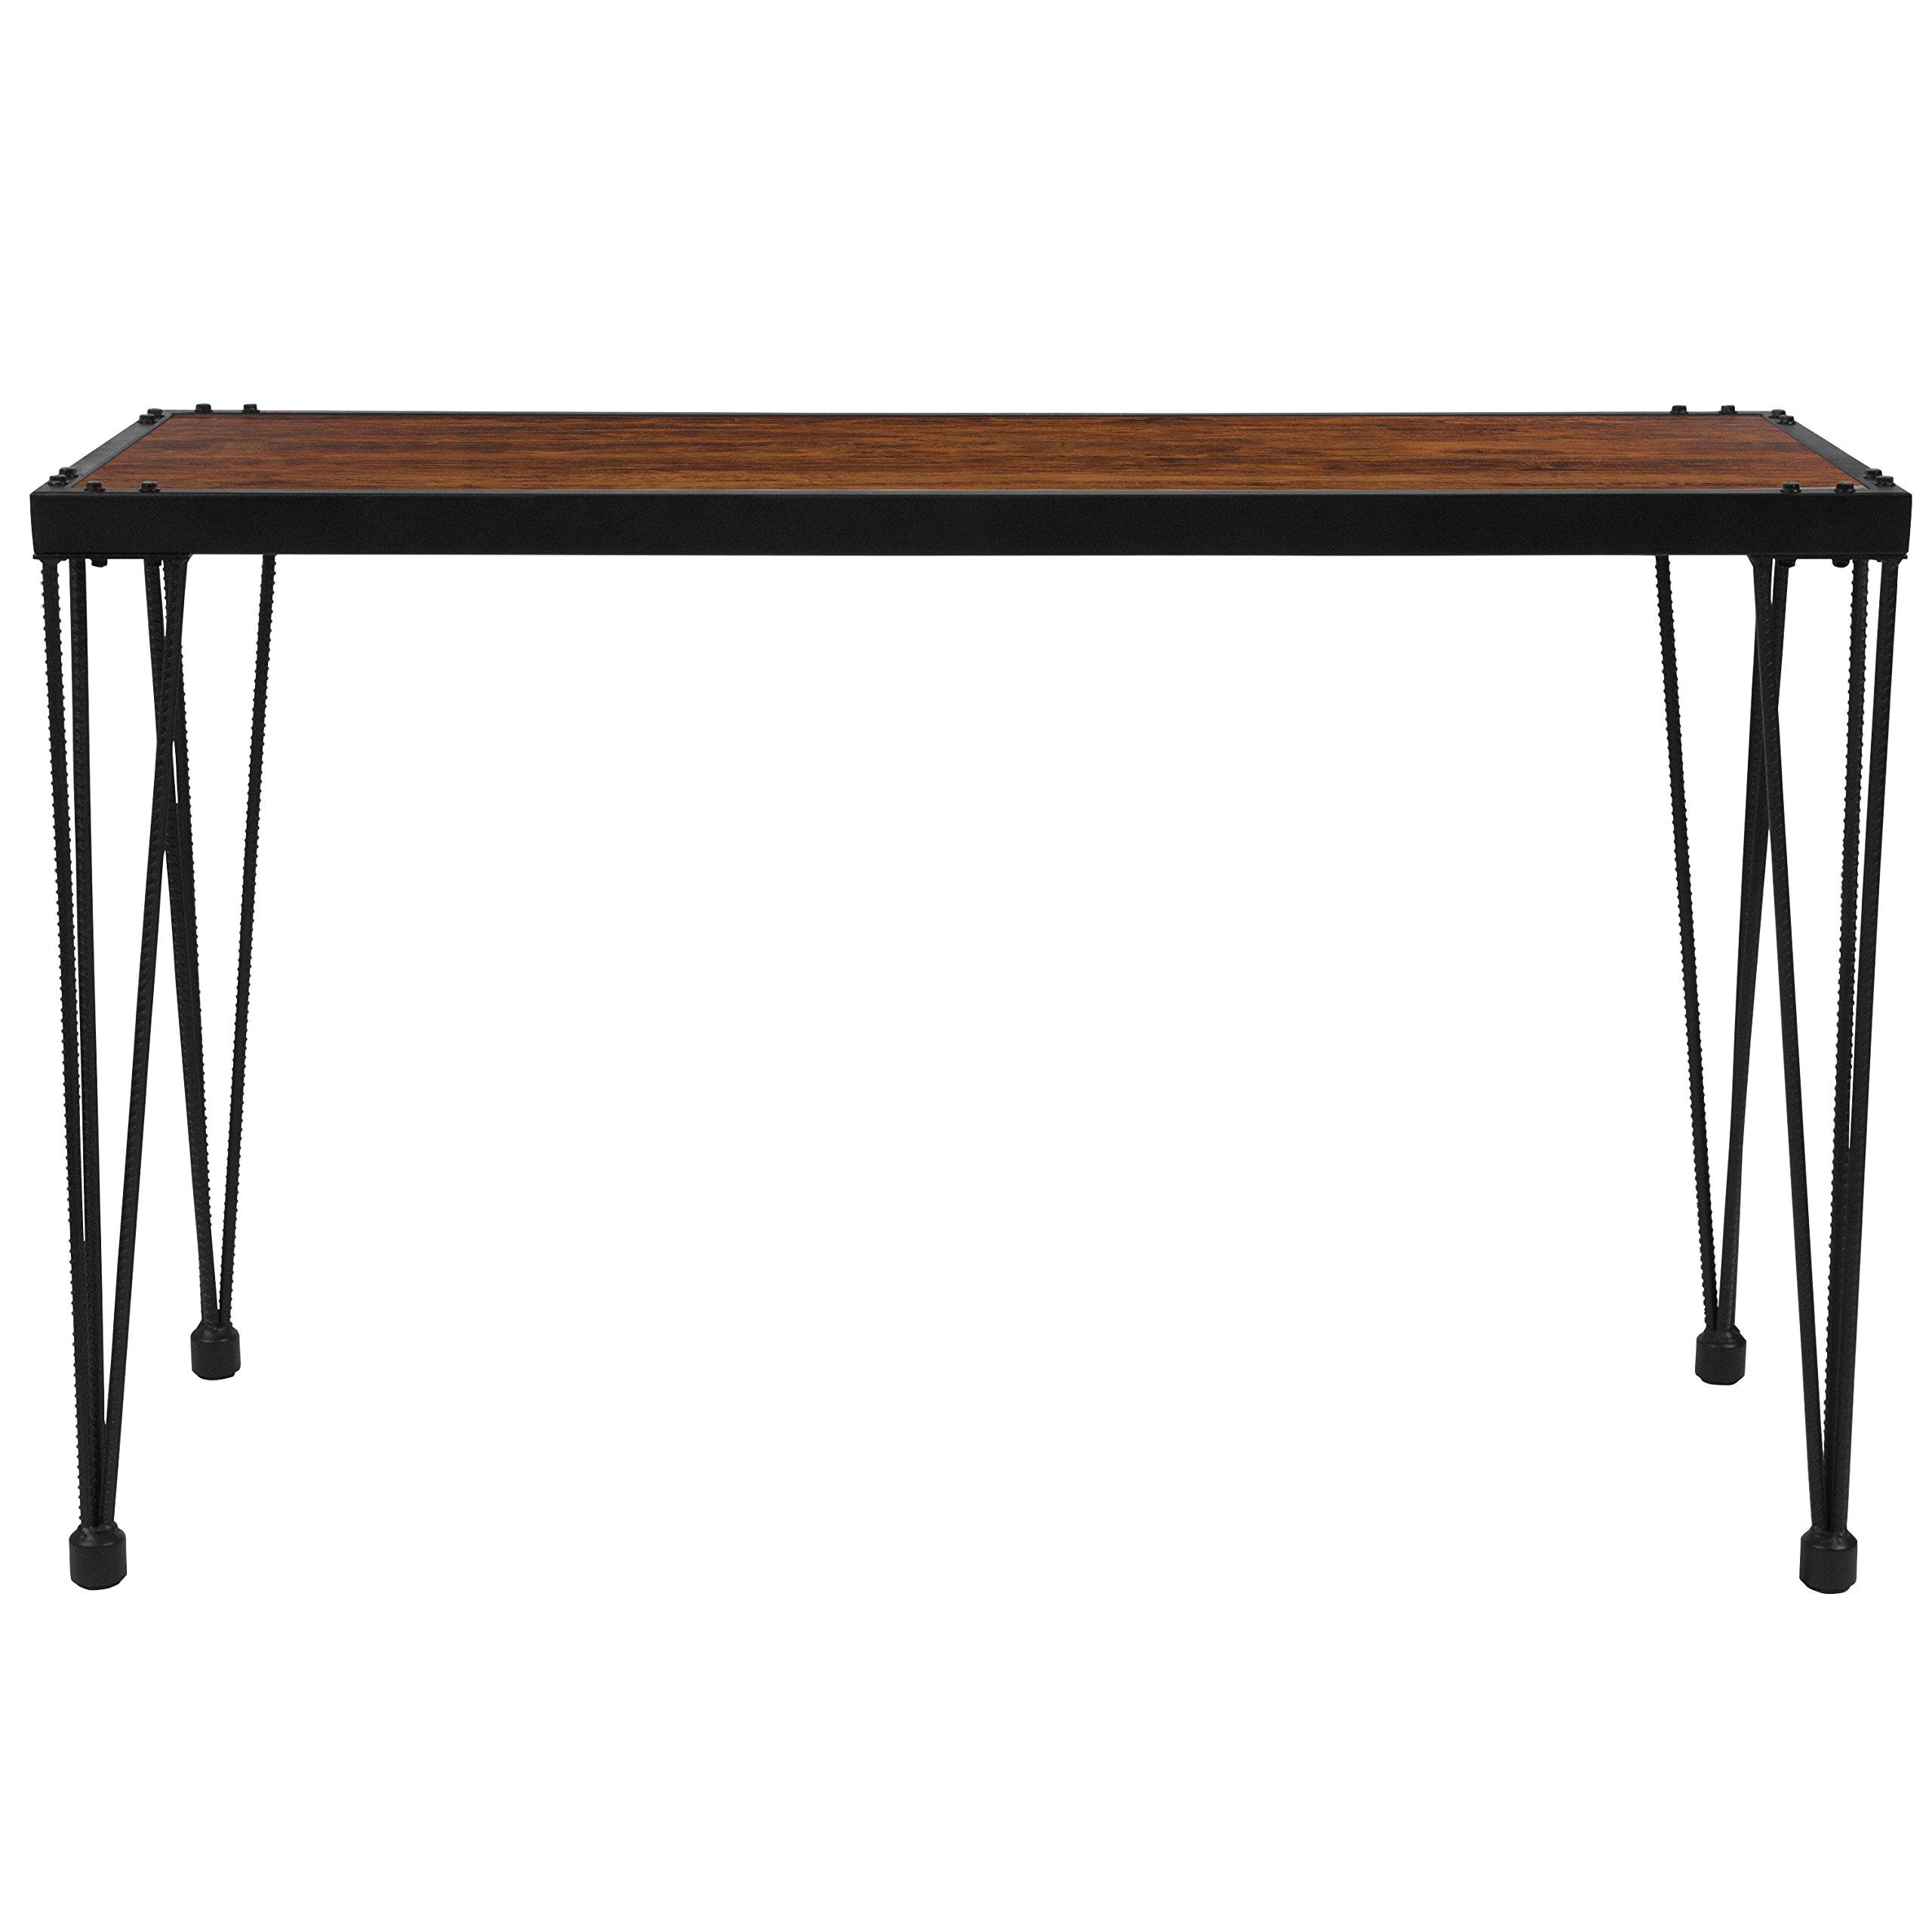 Flash Furniture Baldwin Collection Rustic Walnut Burl Wood Grain Finish Console Table with Black Metal Legs by Flash Furniture (Image #2)